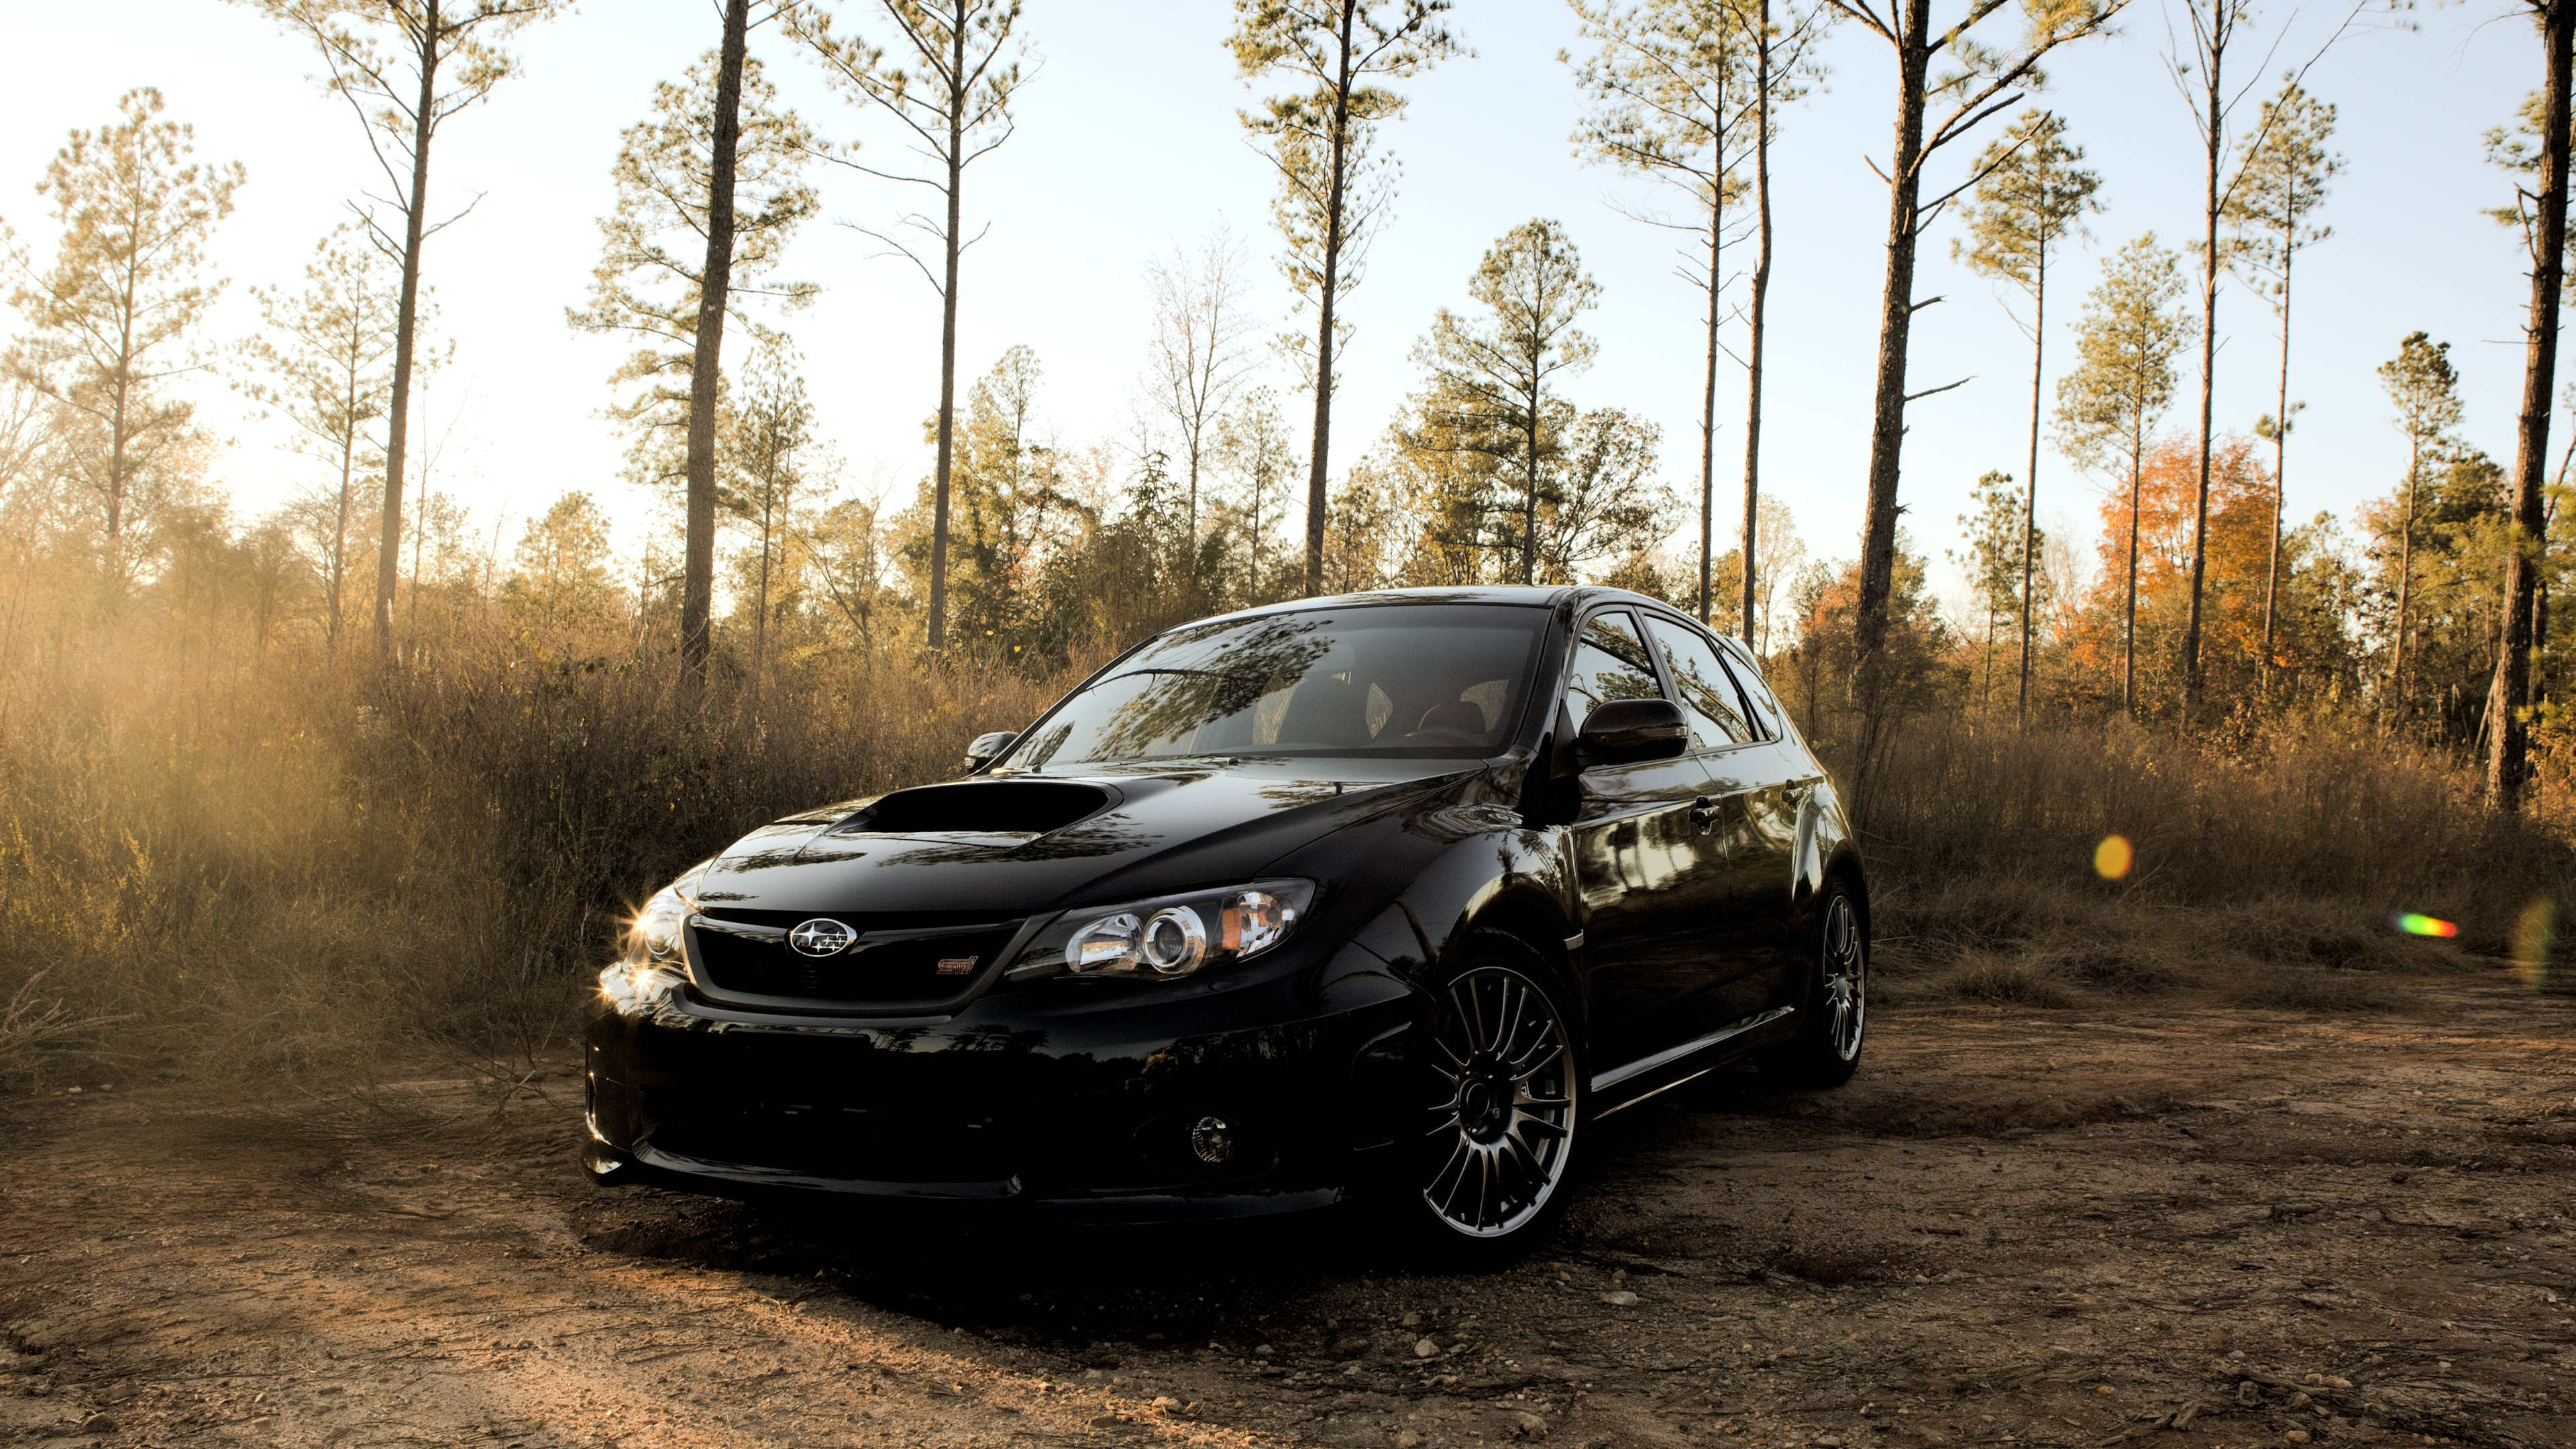 Subaru impreza wrx hd wallpapers 4k wallpaper 2 subaru impreza wrx sti ultra hd 4k 3840x2160 vanachro Images